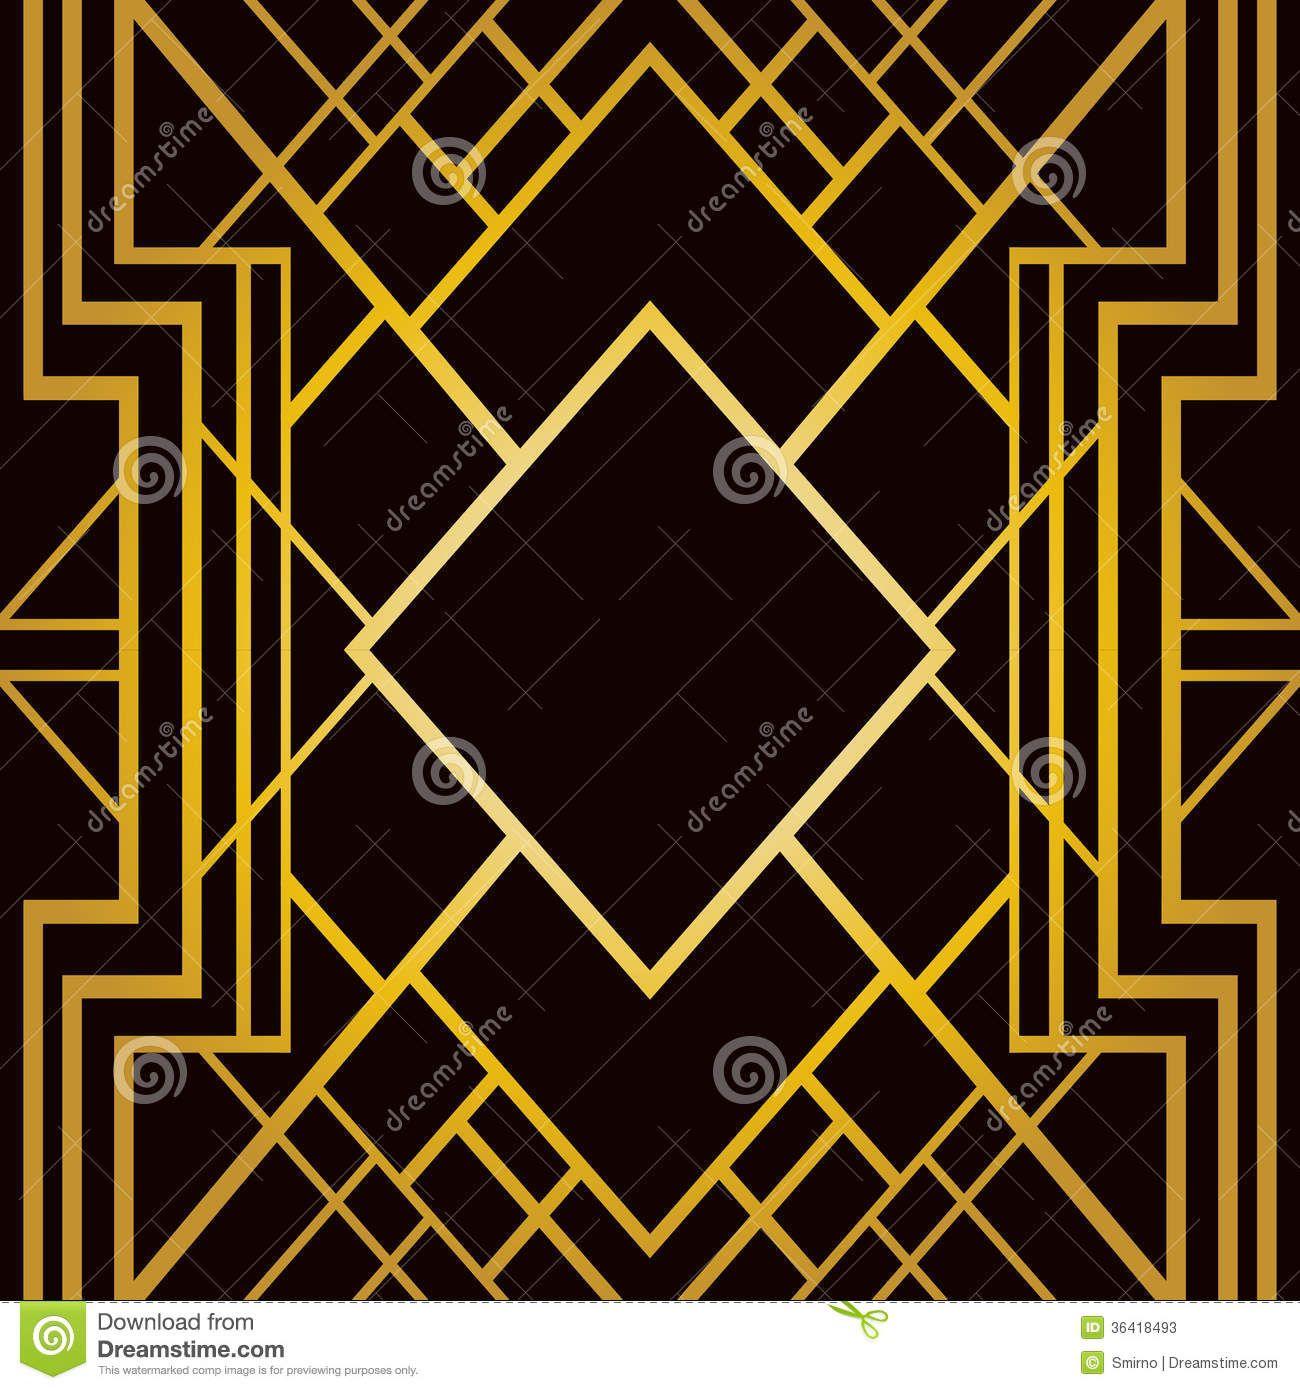 Art Deco Geometric Pattern Art Deco Pattern Art Deco Illustration Art Deco